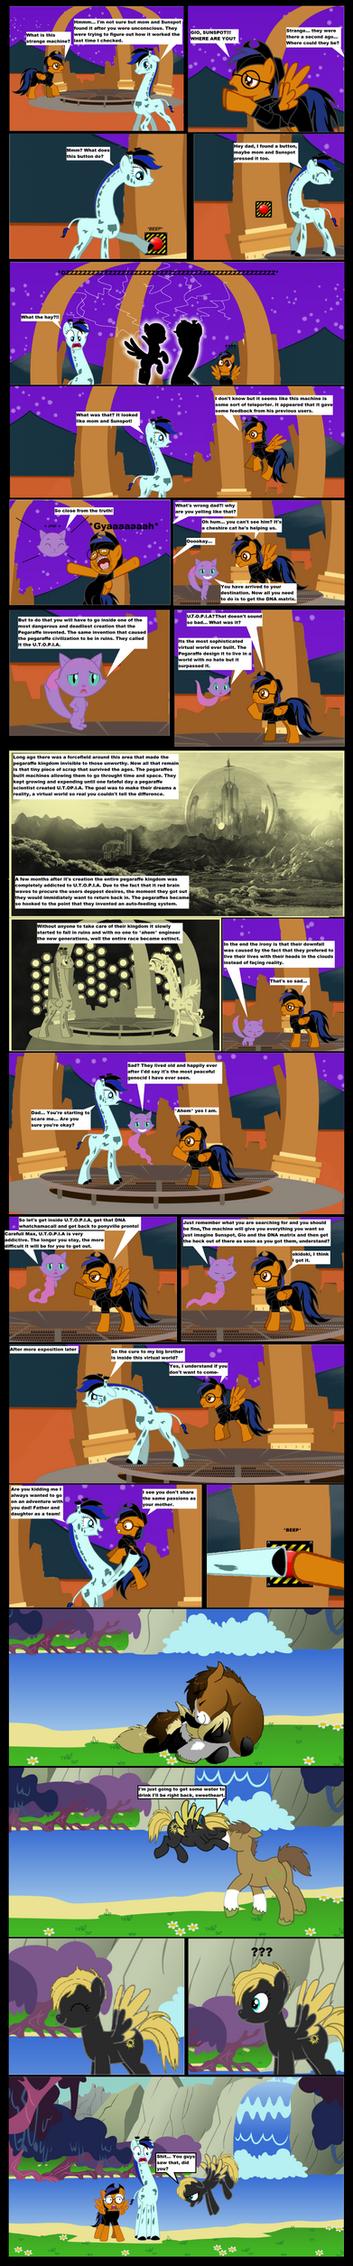 The pegaraffe disease 12 by darkoak213